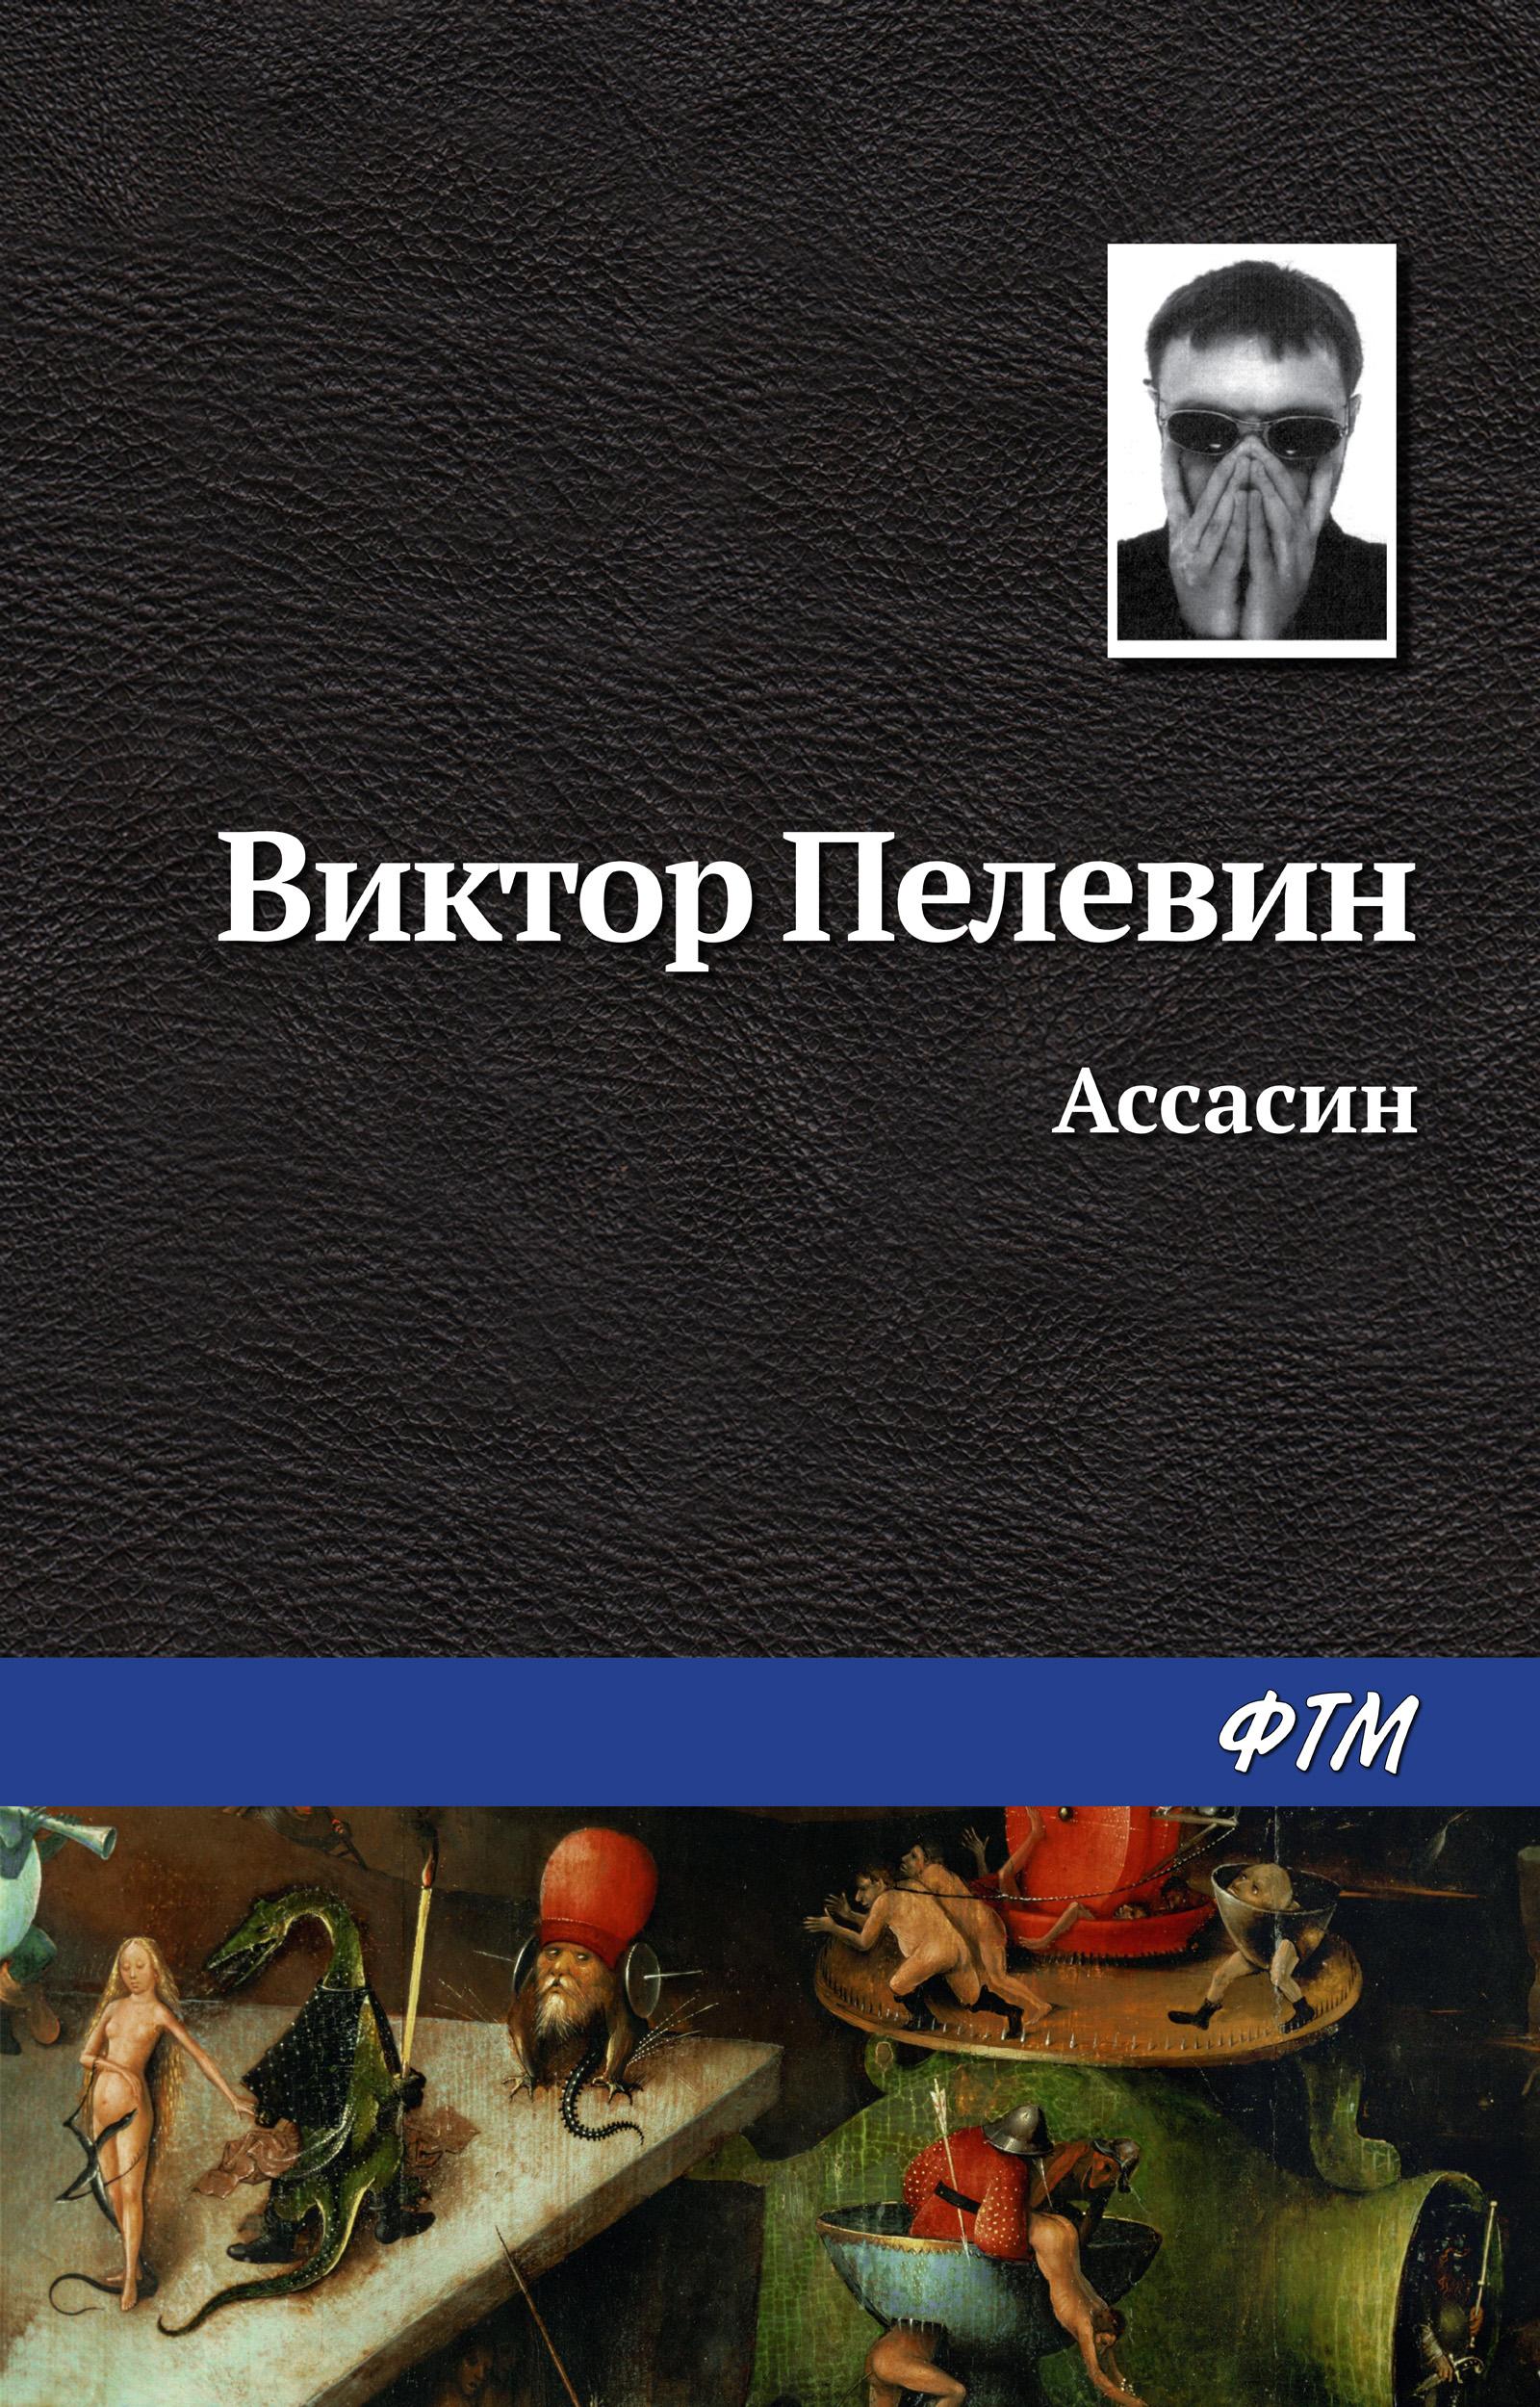 Виктор Пелевин Ассасин виктор пелевин икстлан – петушки